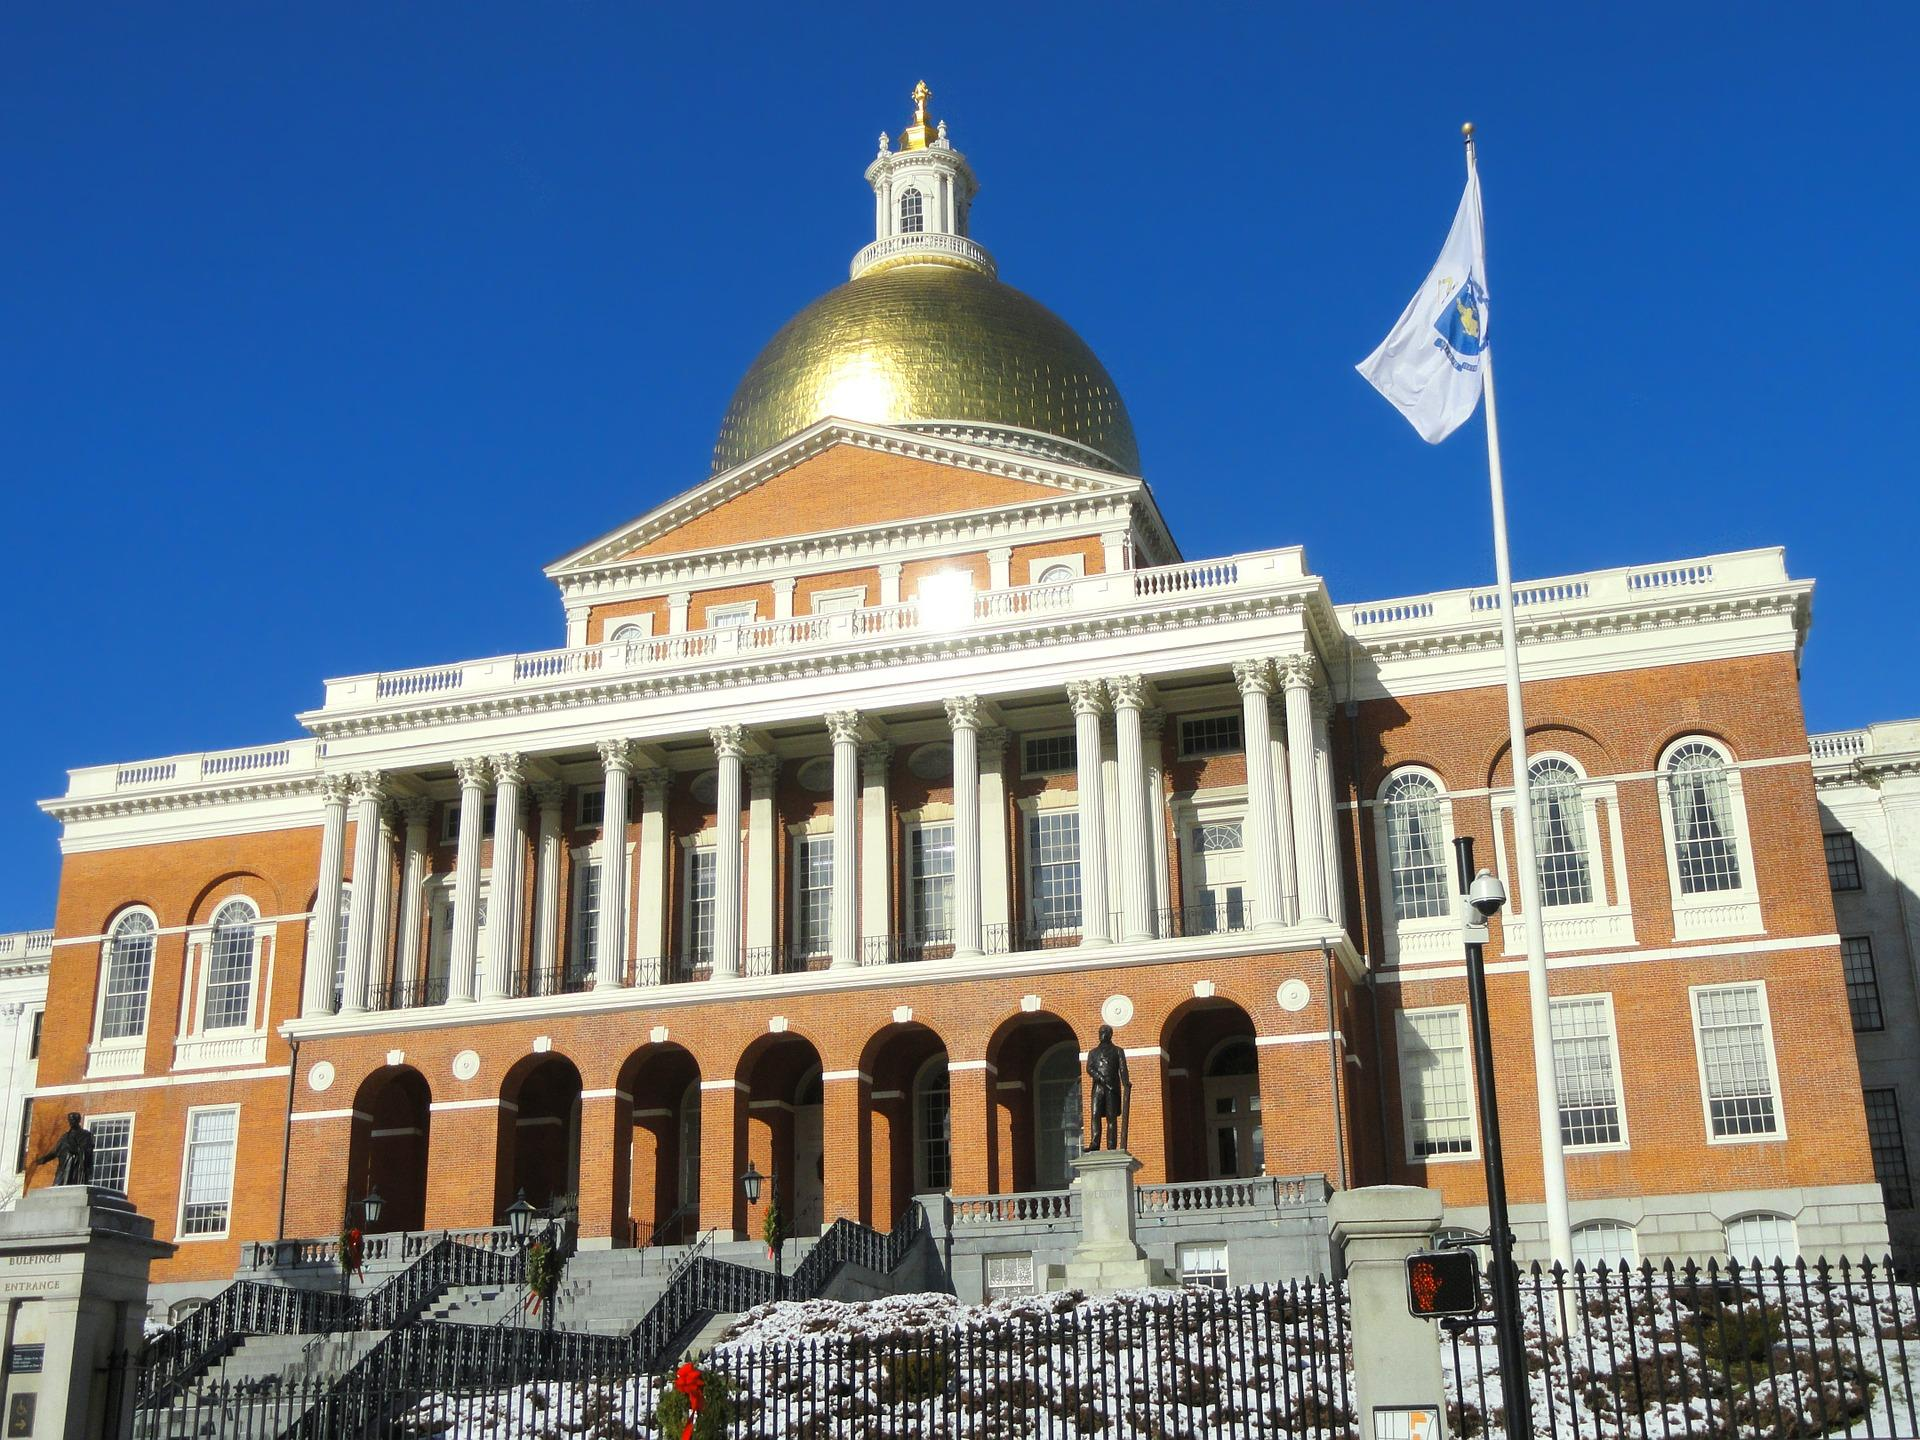 Exterior of Massachusetts State House